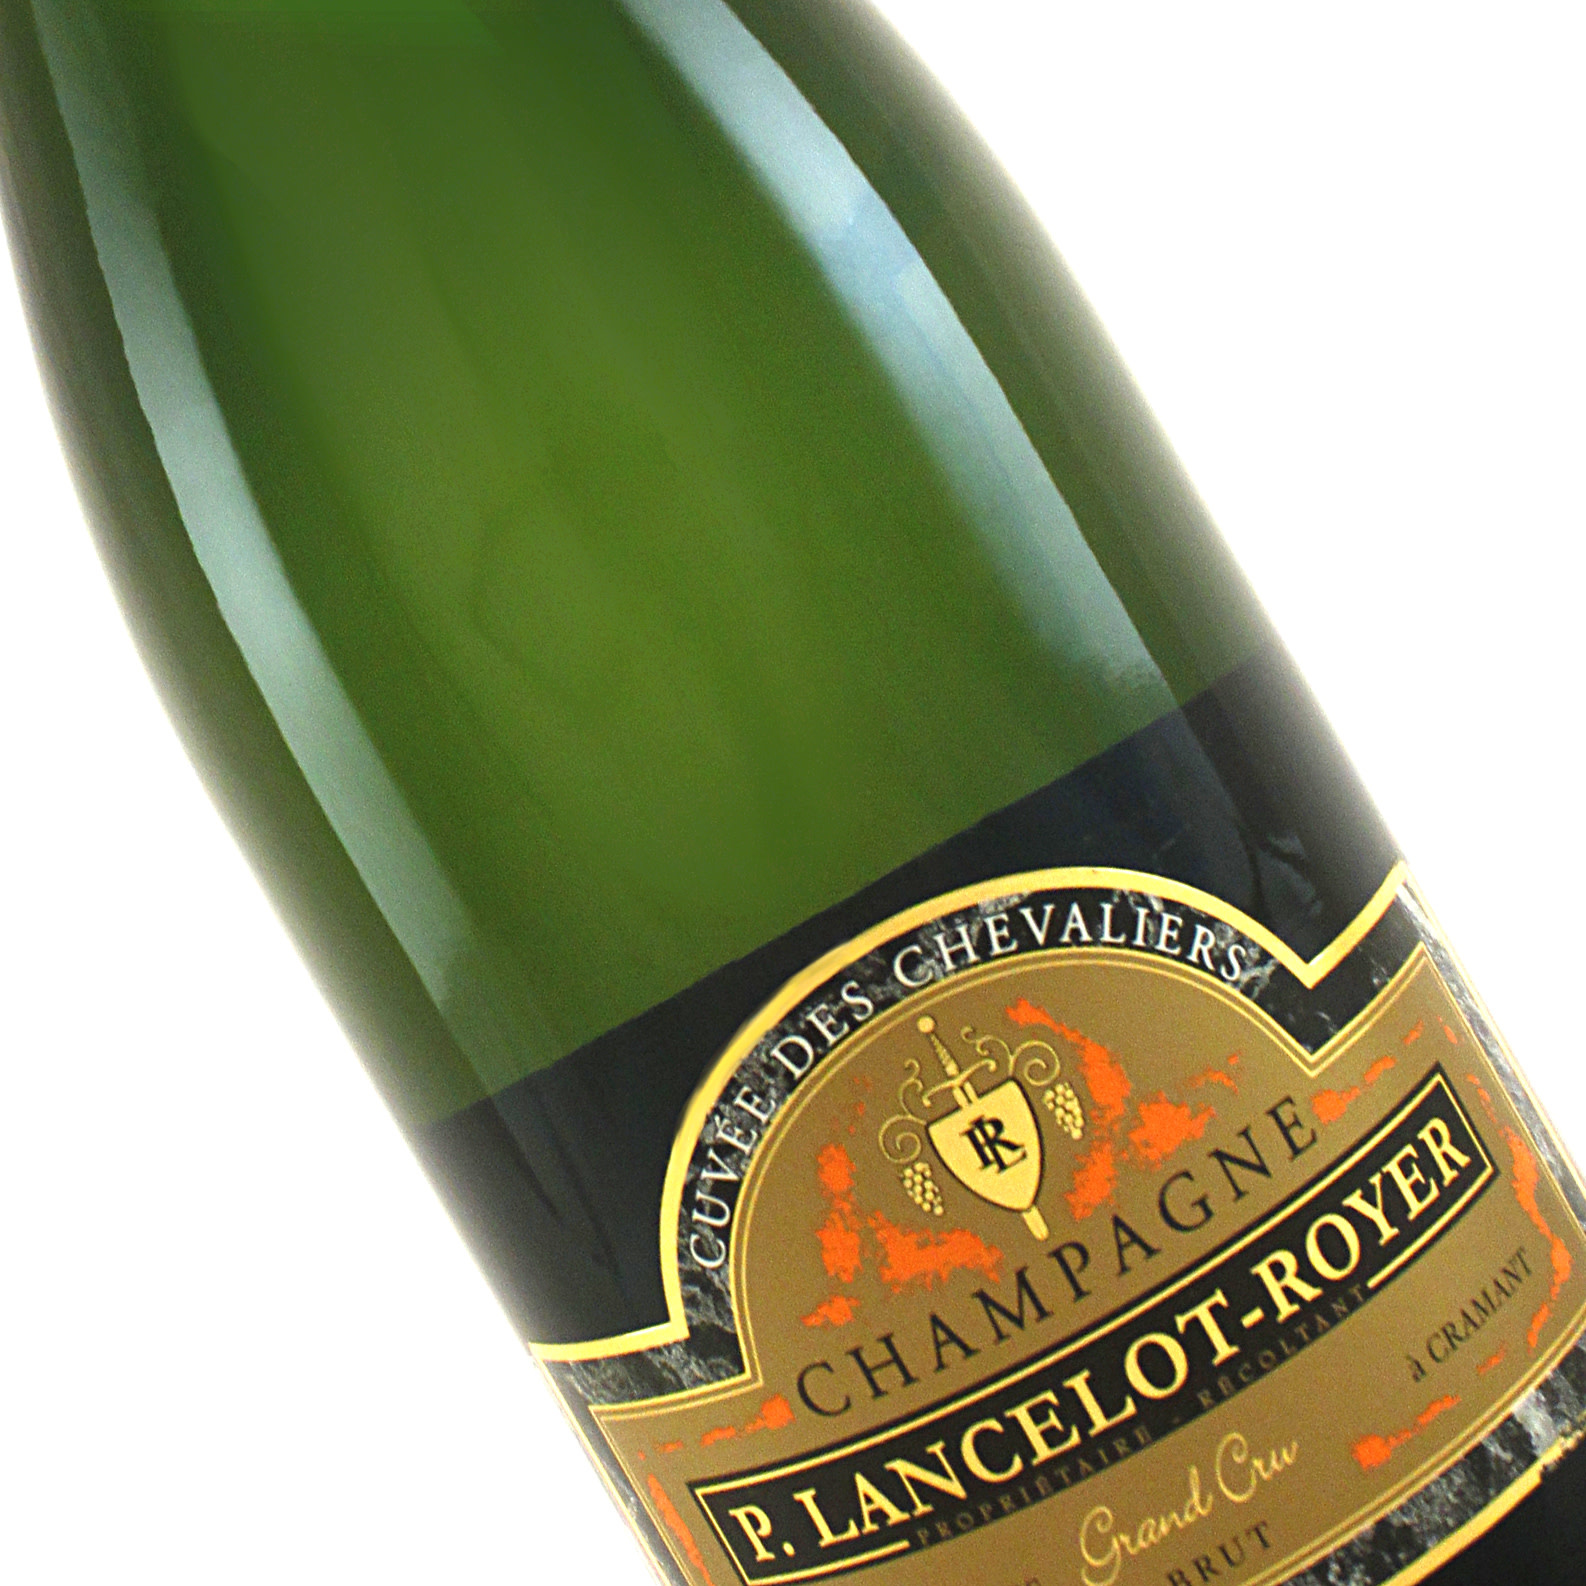 Lancelot-Royer N.V. Champagne Brut Cuvee Des Chevaliers